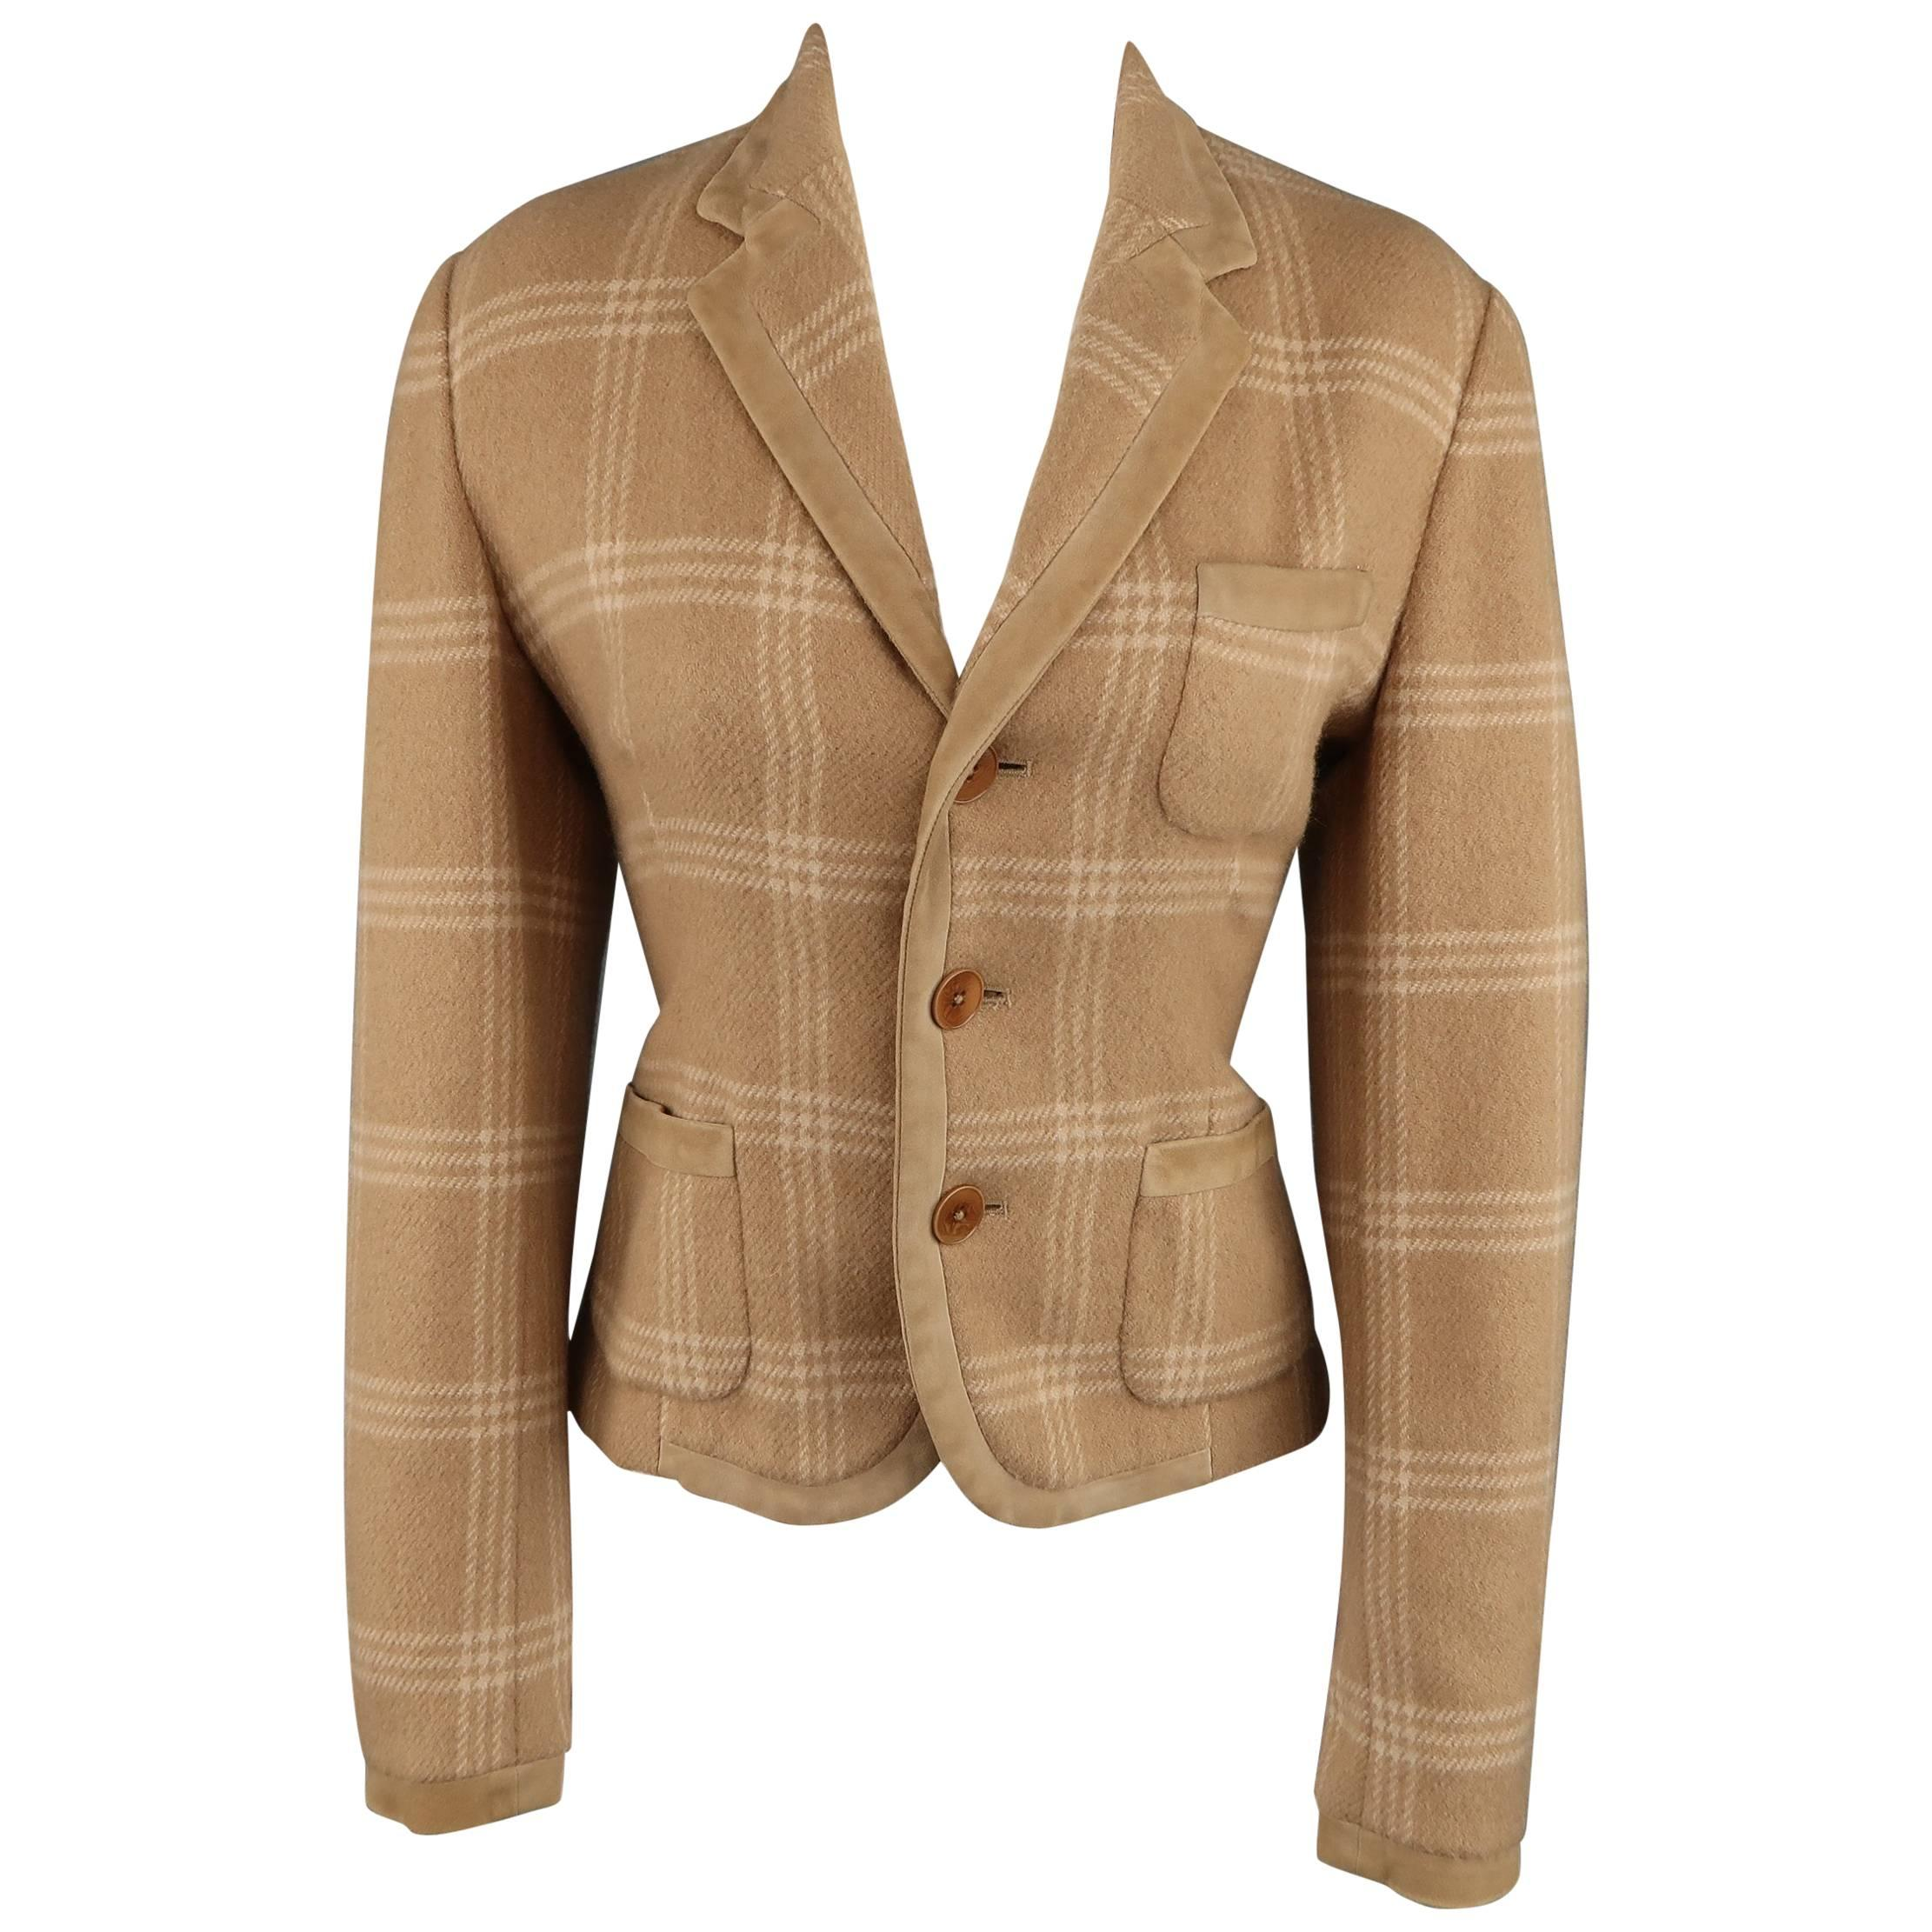 RALPH LAUREN COLLECTION Size 8 Plaid Camel Wool Suede Trim Jacket